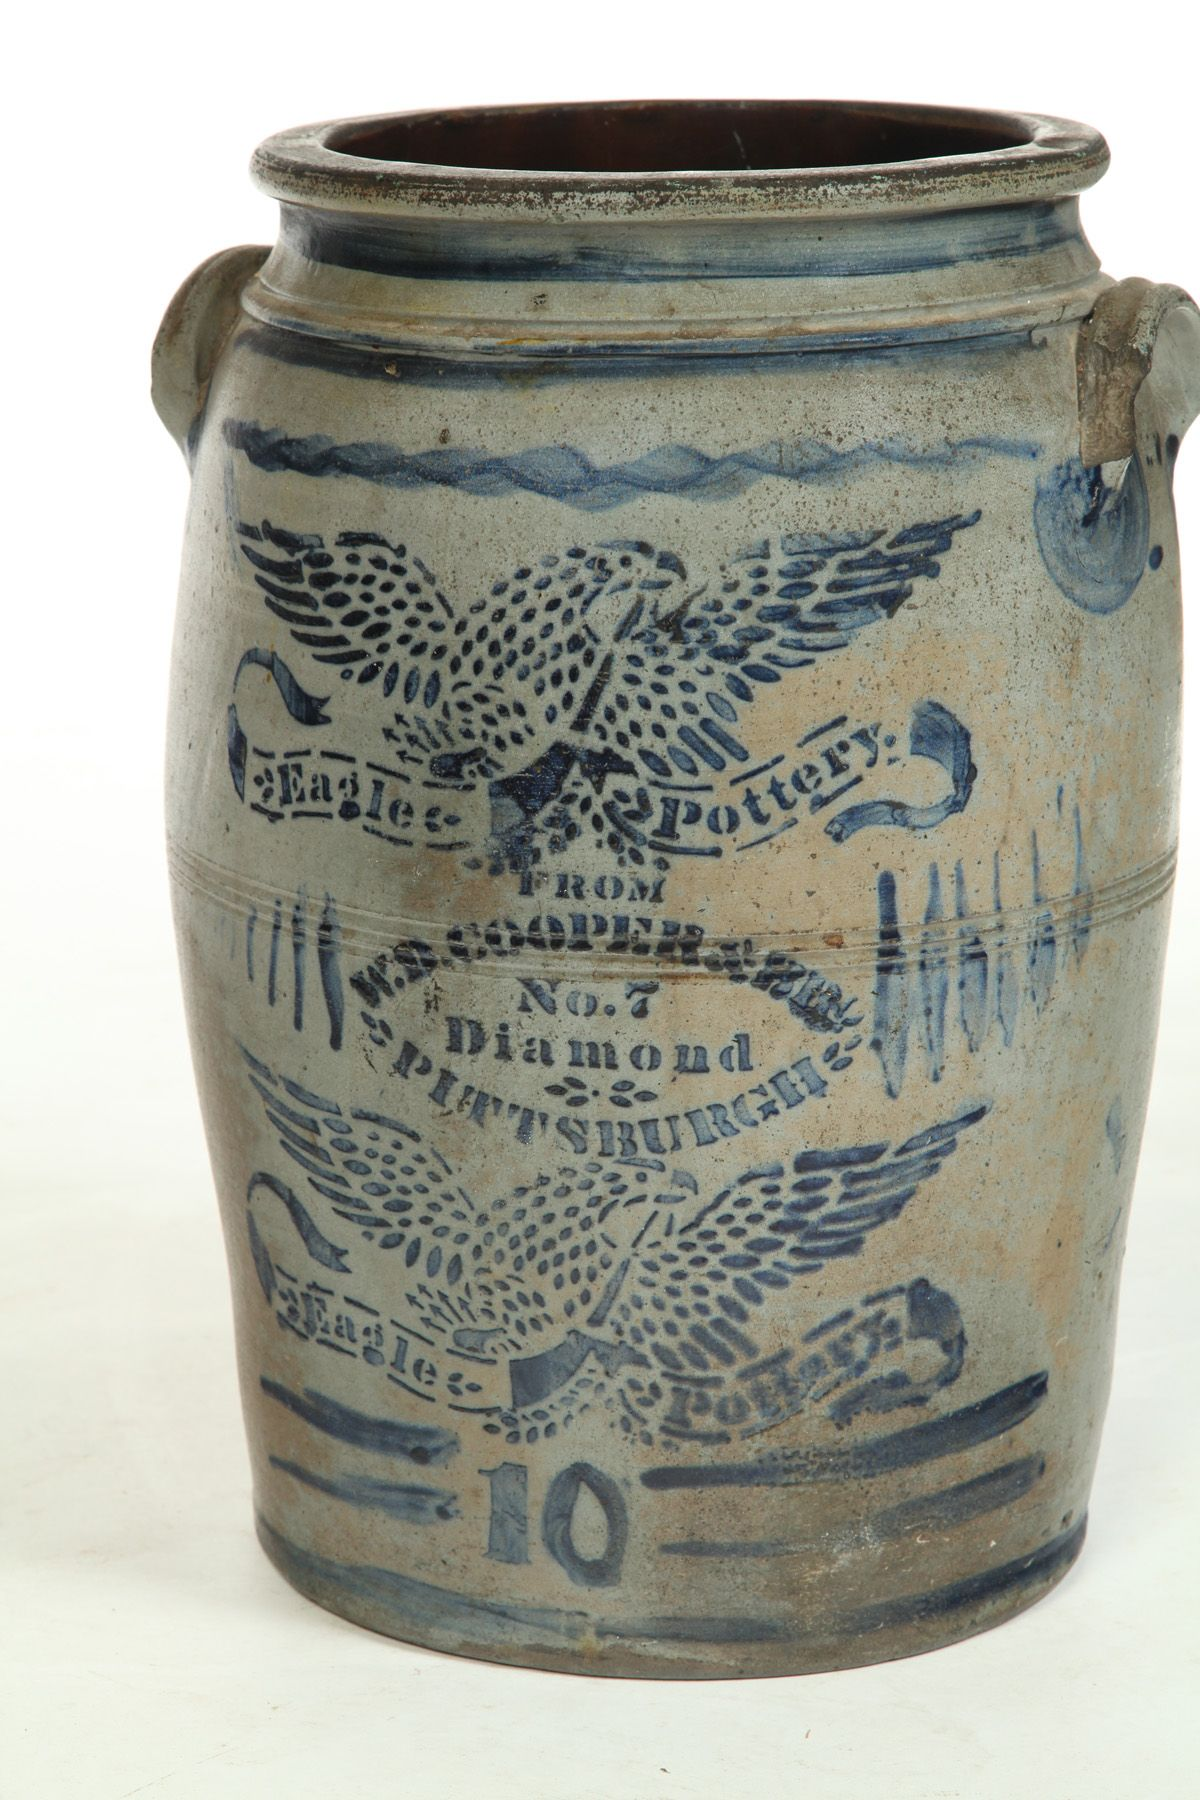 Pennsylvania Decorated Stoneware Crock Eagle Pottery